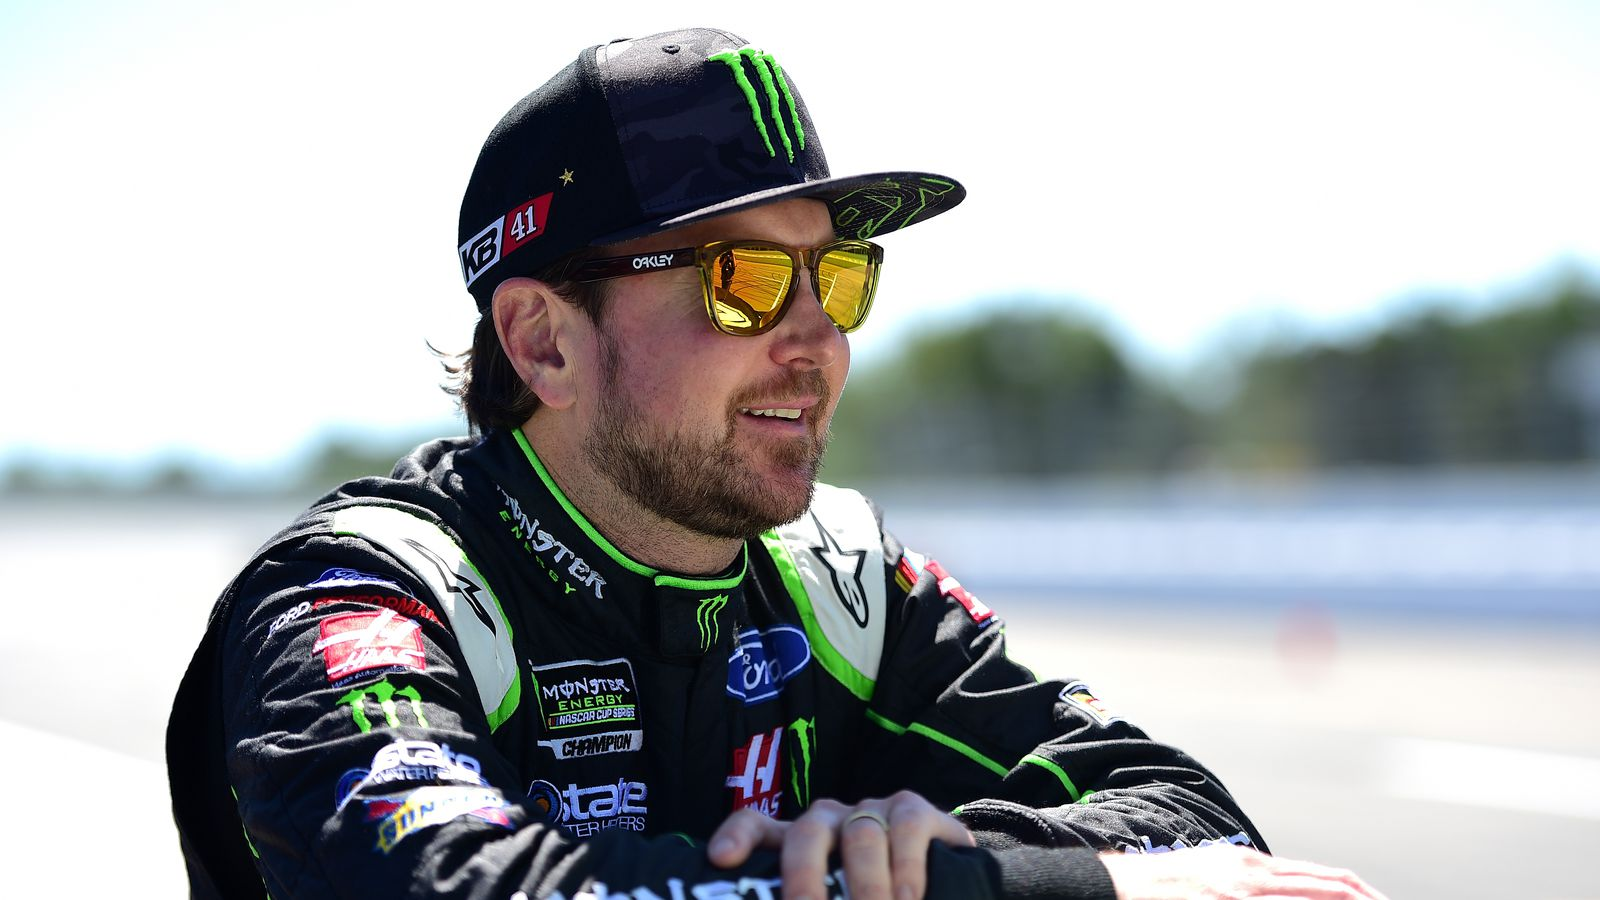 9aae608402d Kurt Busch's 2018 contract not renewed by Stewart-Haas Racing ...